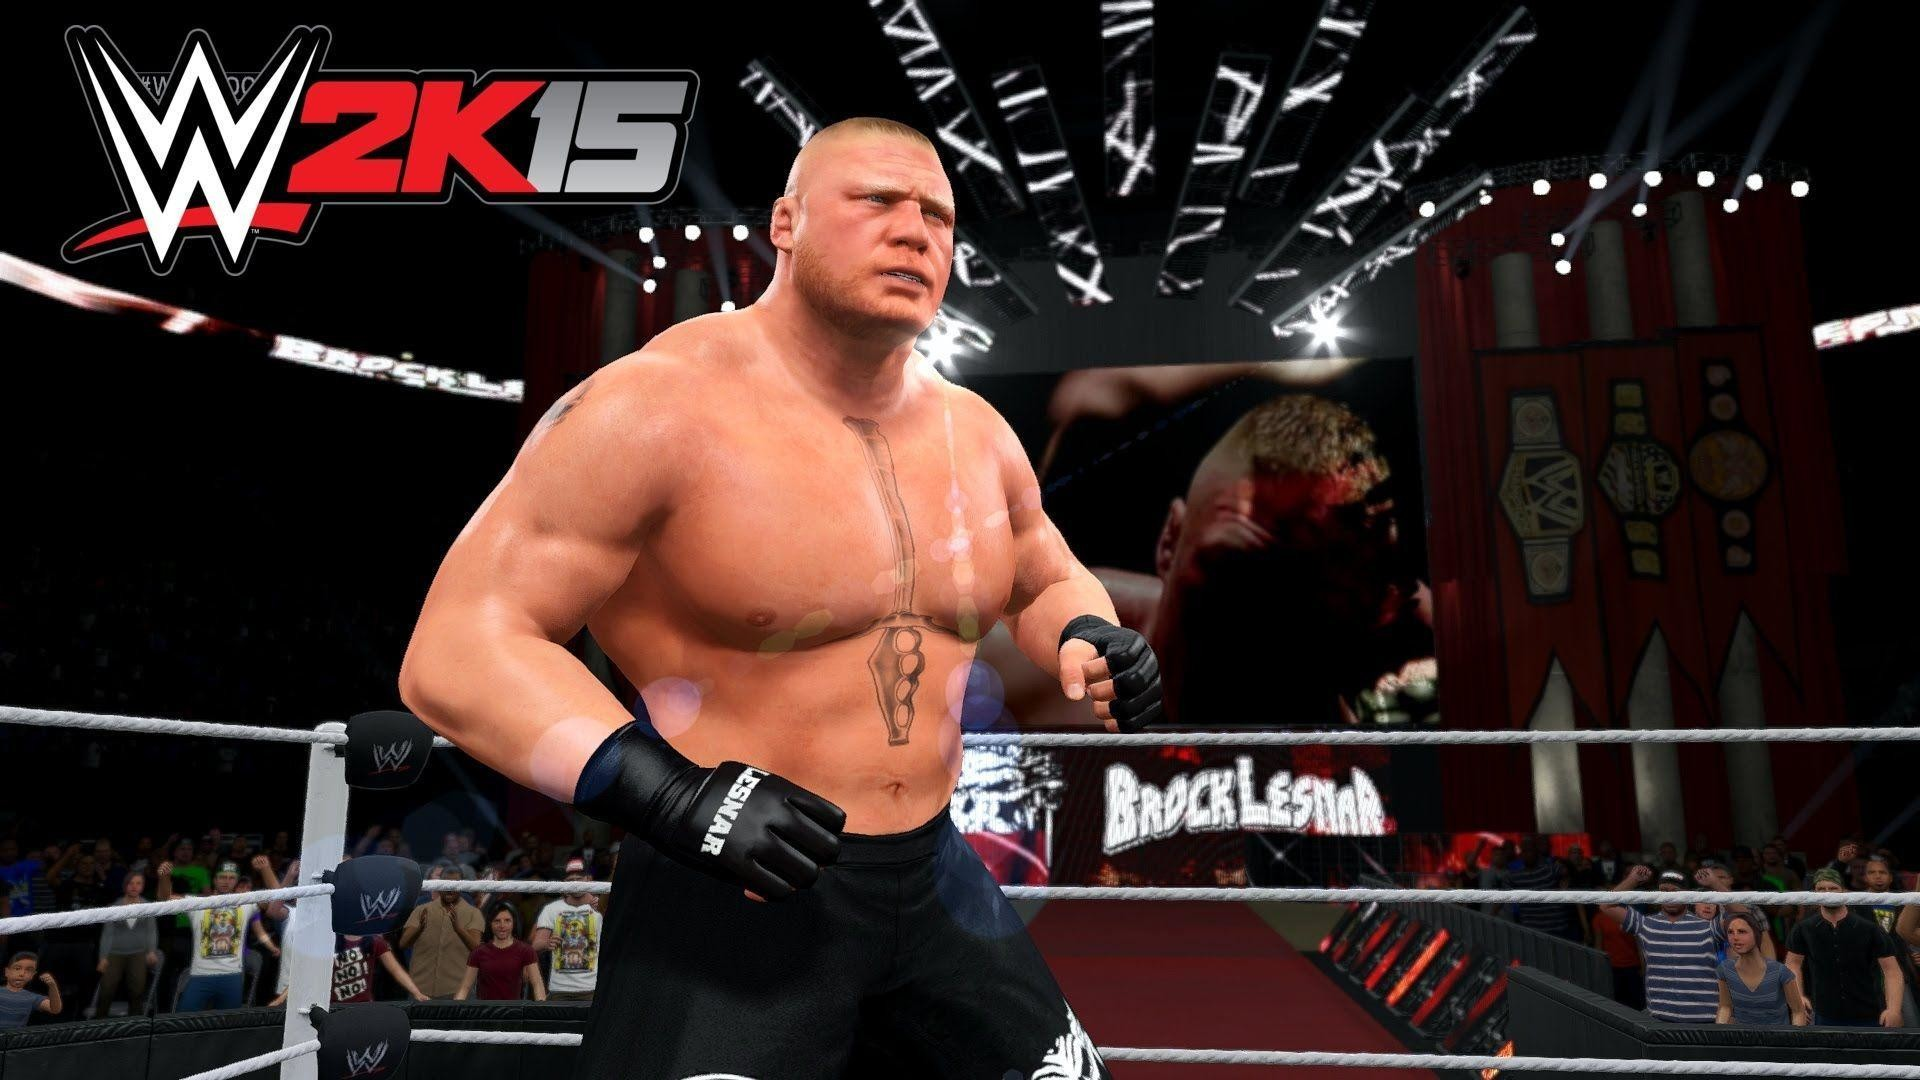 1920x1080 WWE 2K18 Brock Lesnar Wallpaper A Cover